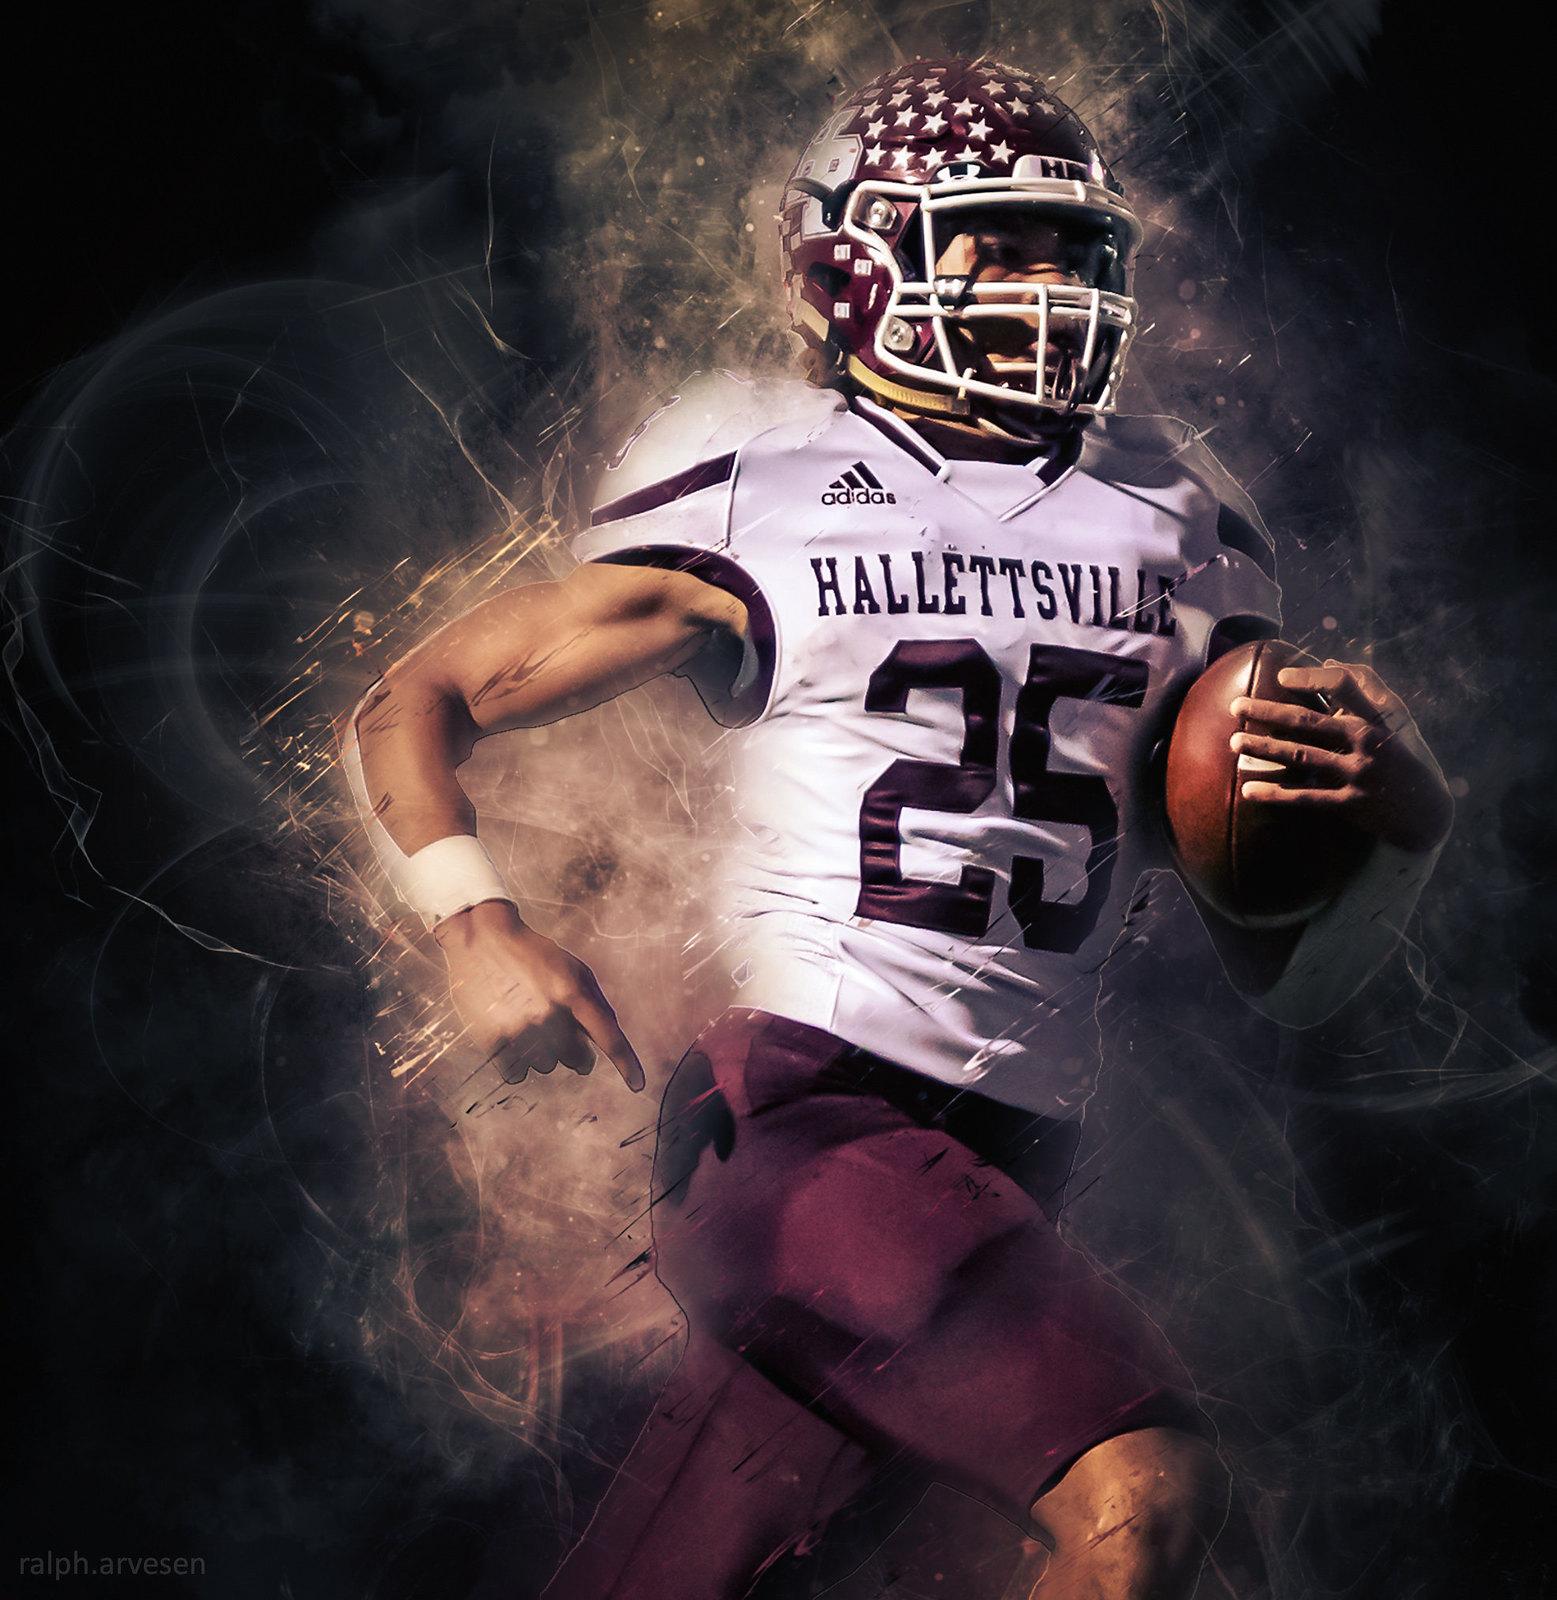 Llano vs Hallettsville | Texas Review | Ralph Arvesen